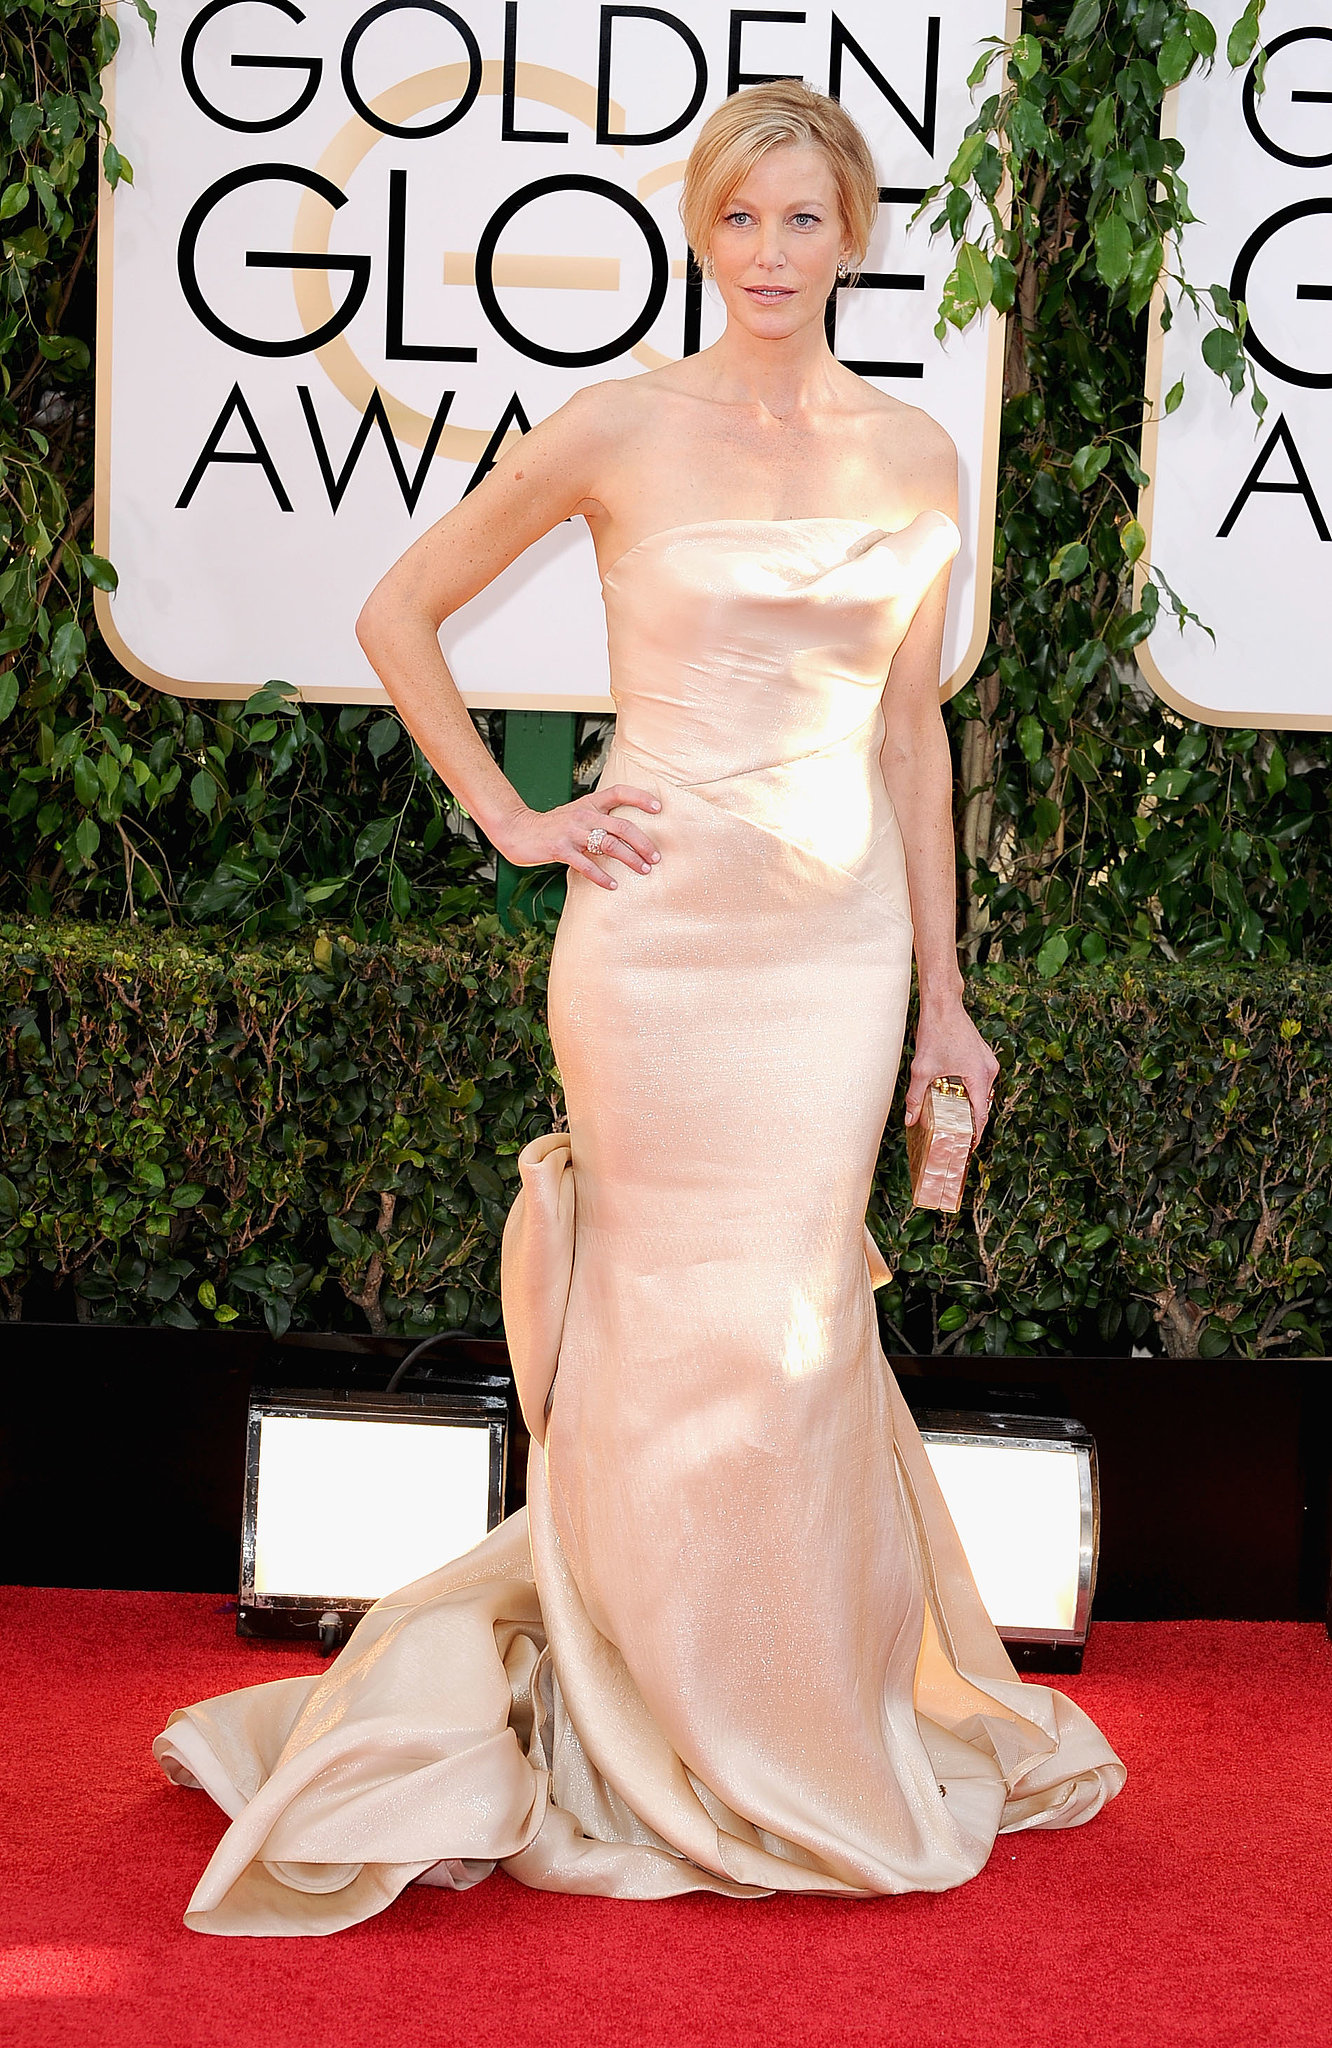 Breaking Bad star Anna Gunn walked the red carpet.